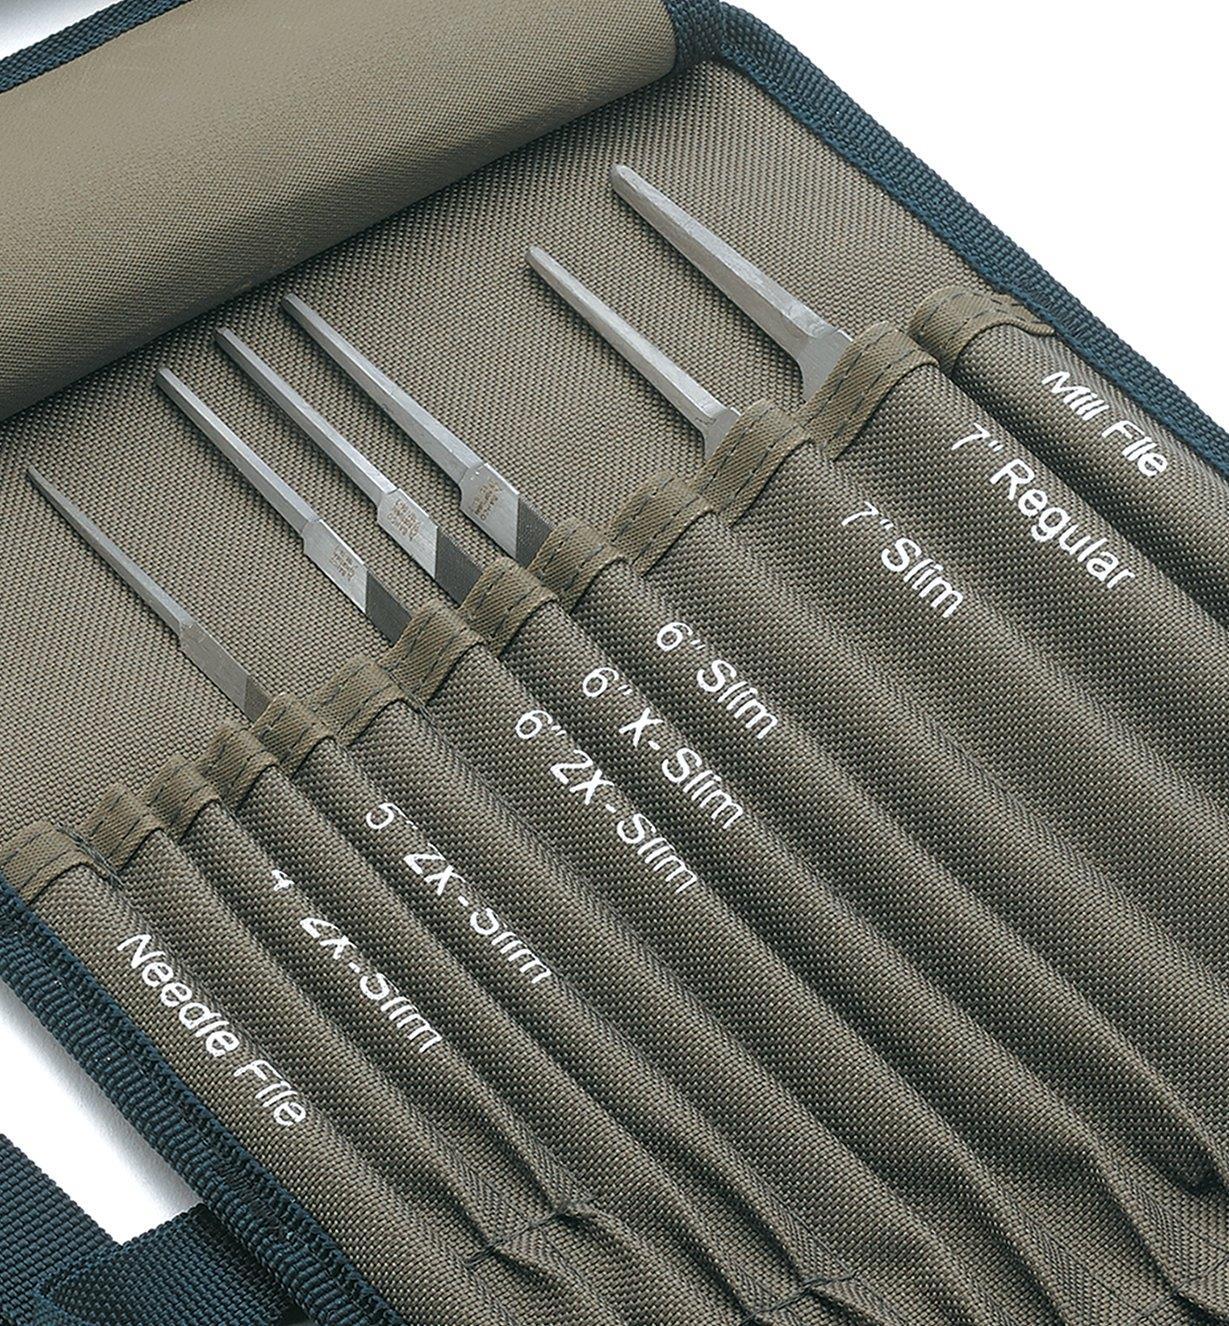 62W3320 - 6-Pc. Saw-Sharpening File Set & Storage Roll